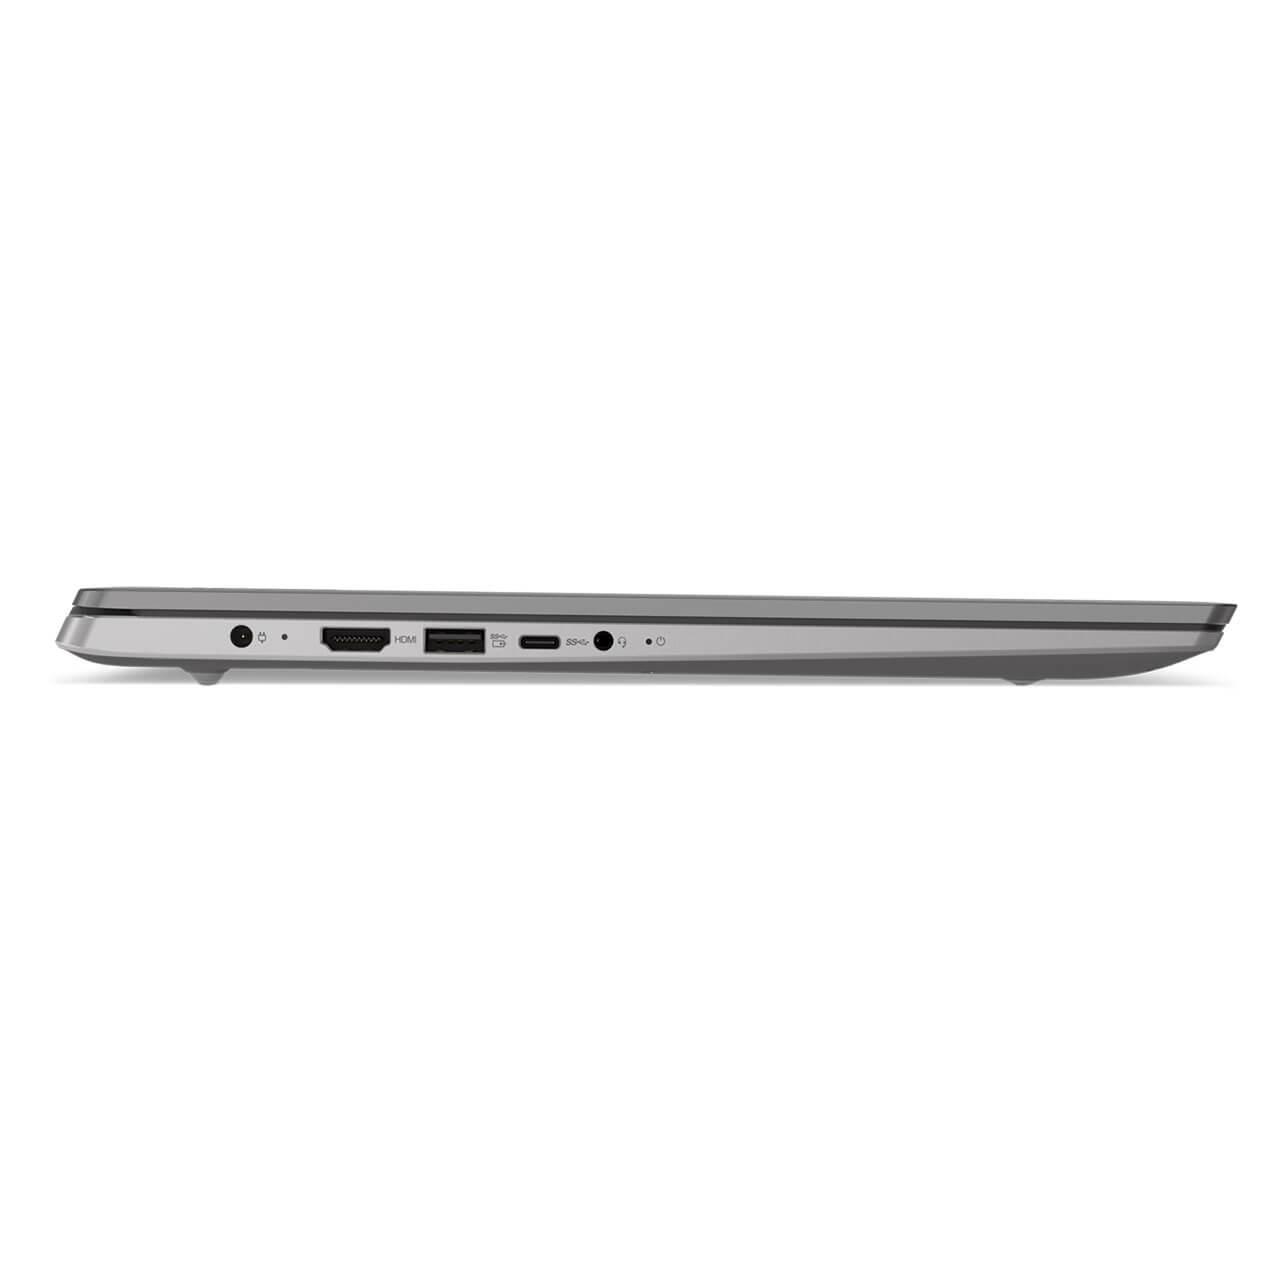 "Lenovo Ideapad 530S, 15.6"", i7-8550U, 8 GB RAM, 512GB SSD, Win 10 Home 64 5"